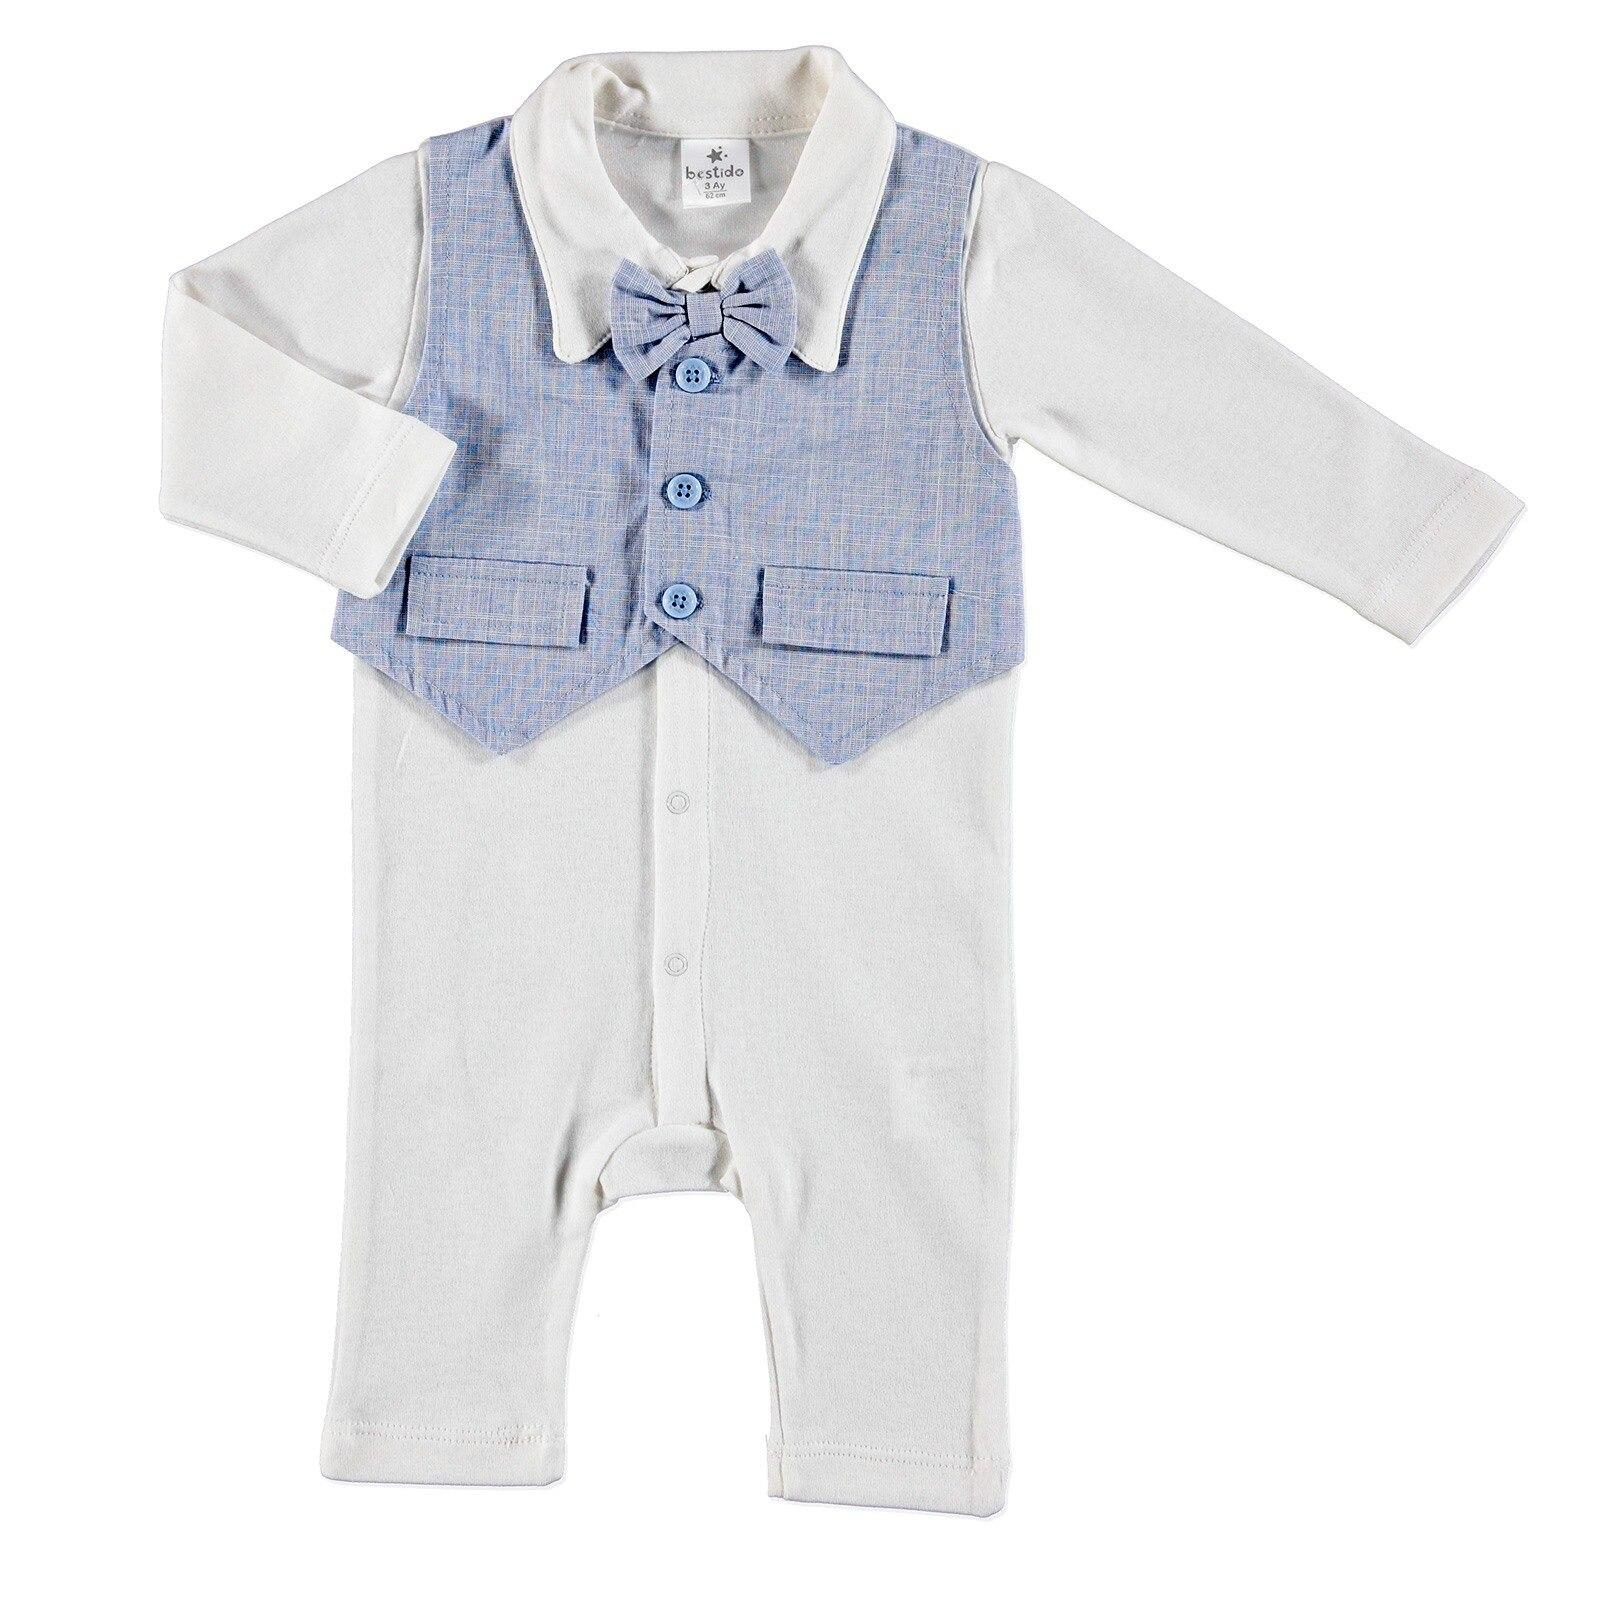 Ebebek Bestido Baby Boy Special Day Bowtie Romper Hat 2 Pcs Set